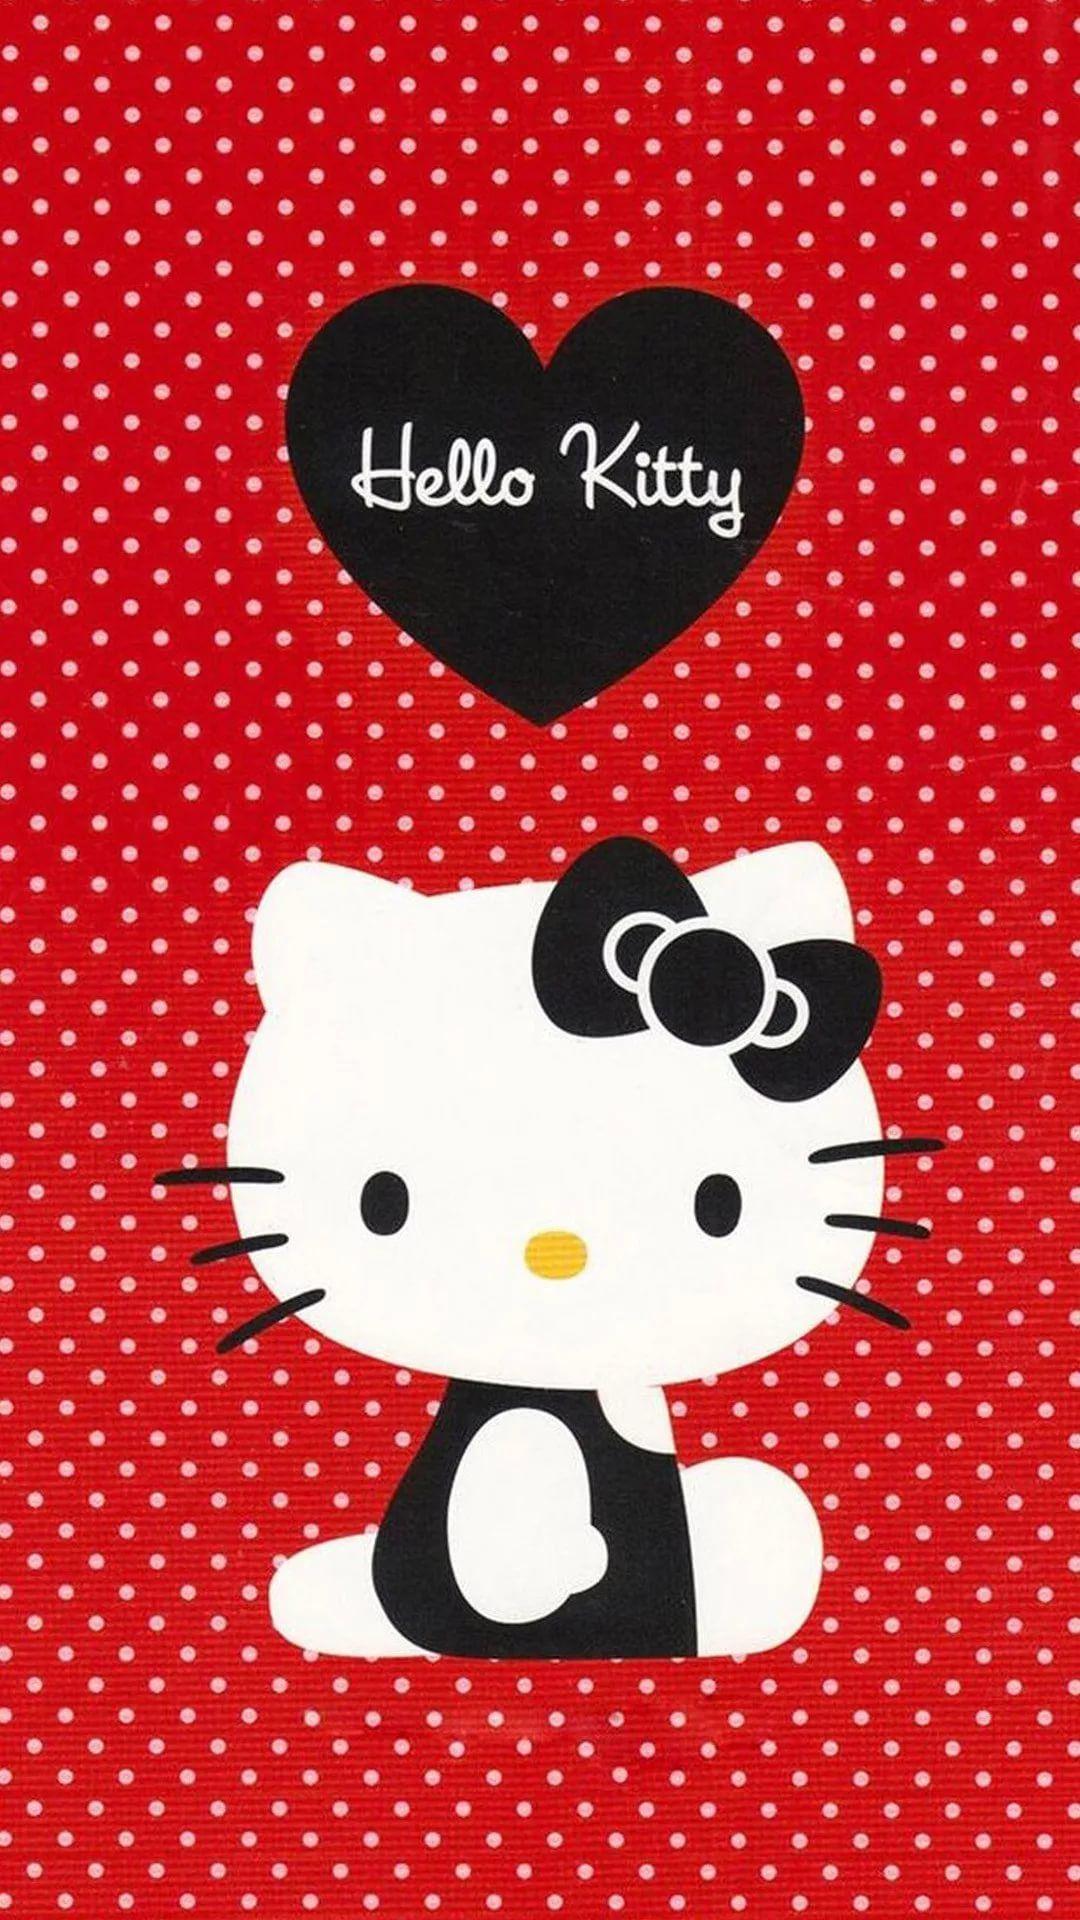 Hello Kitty phone background